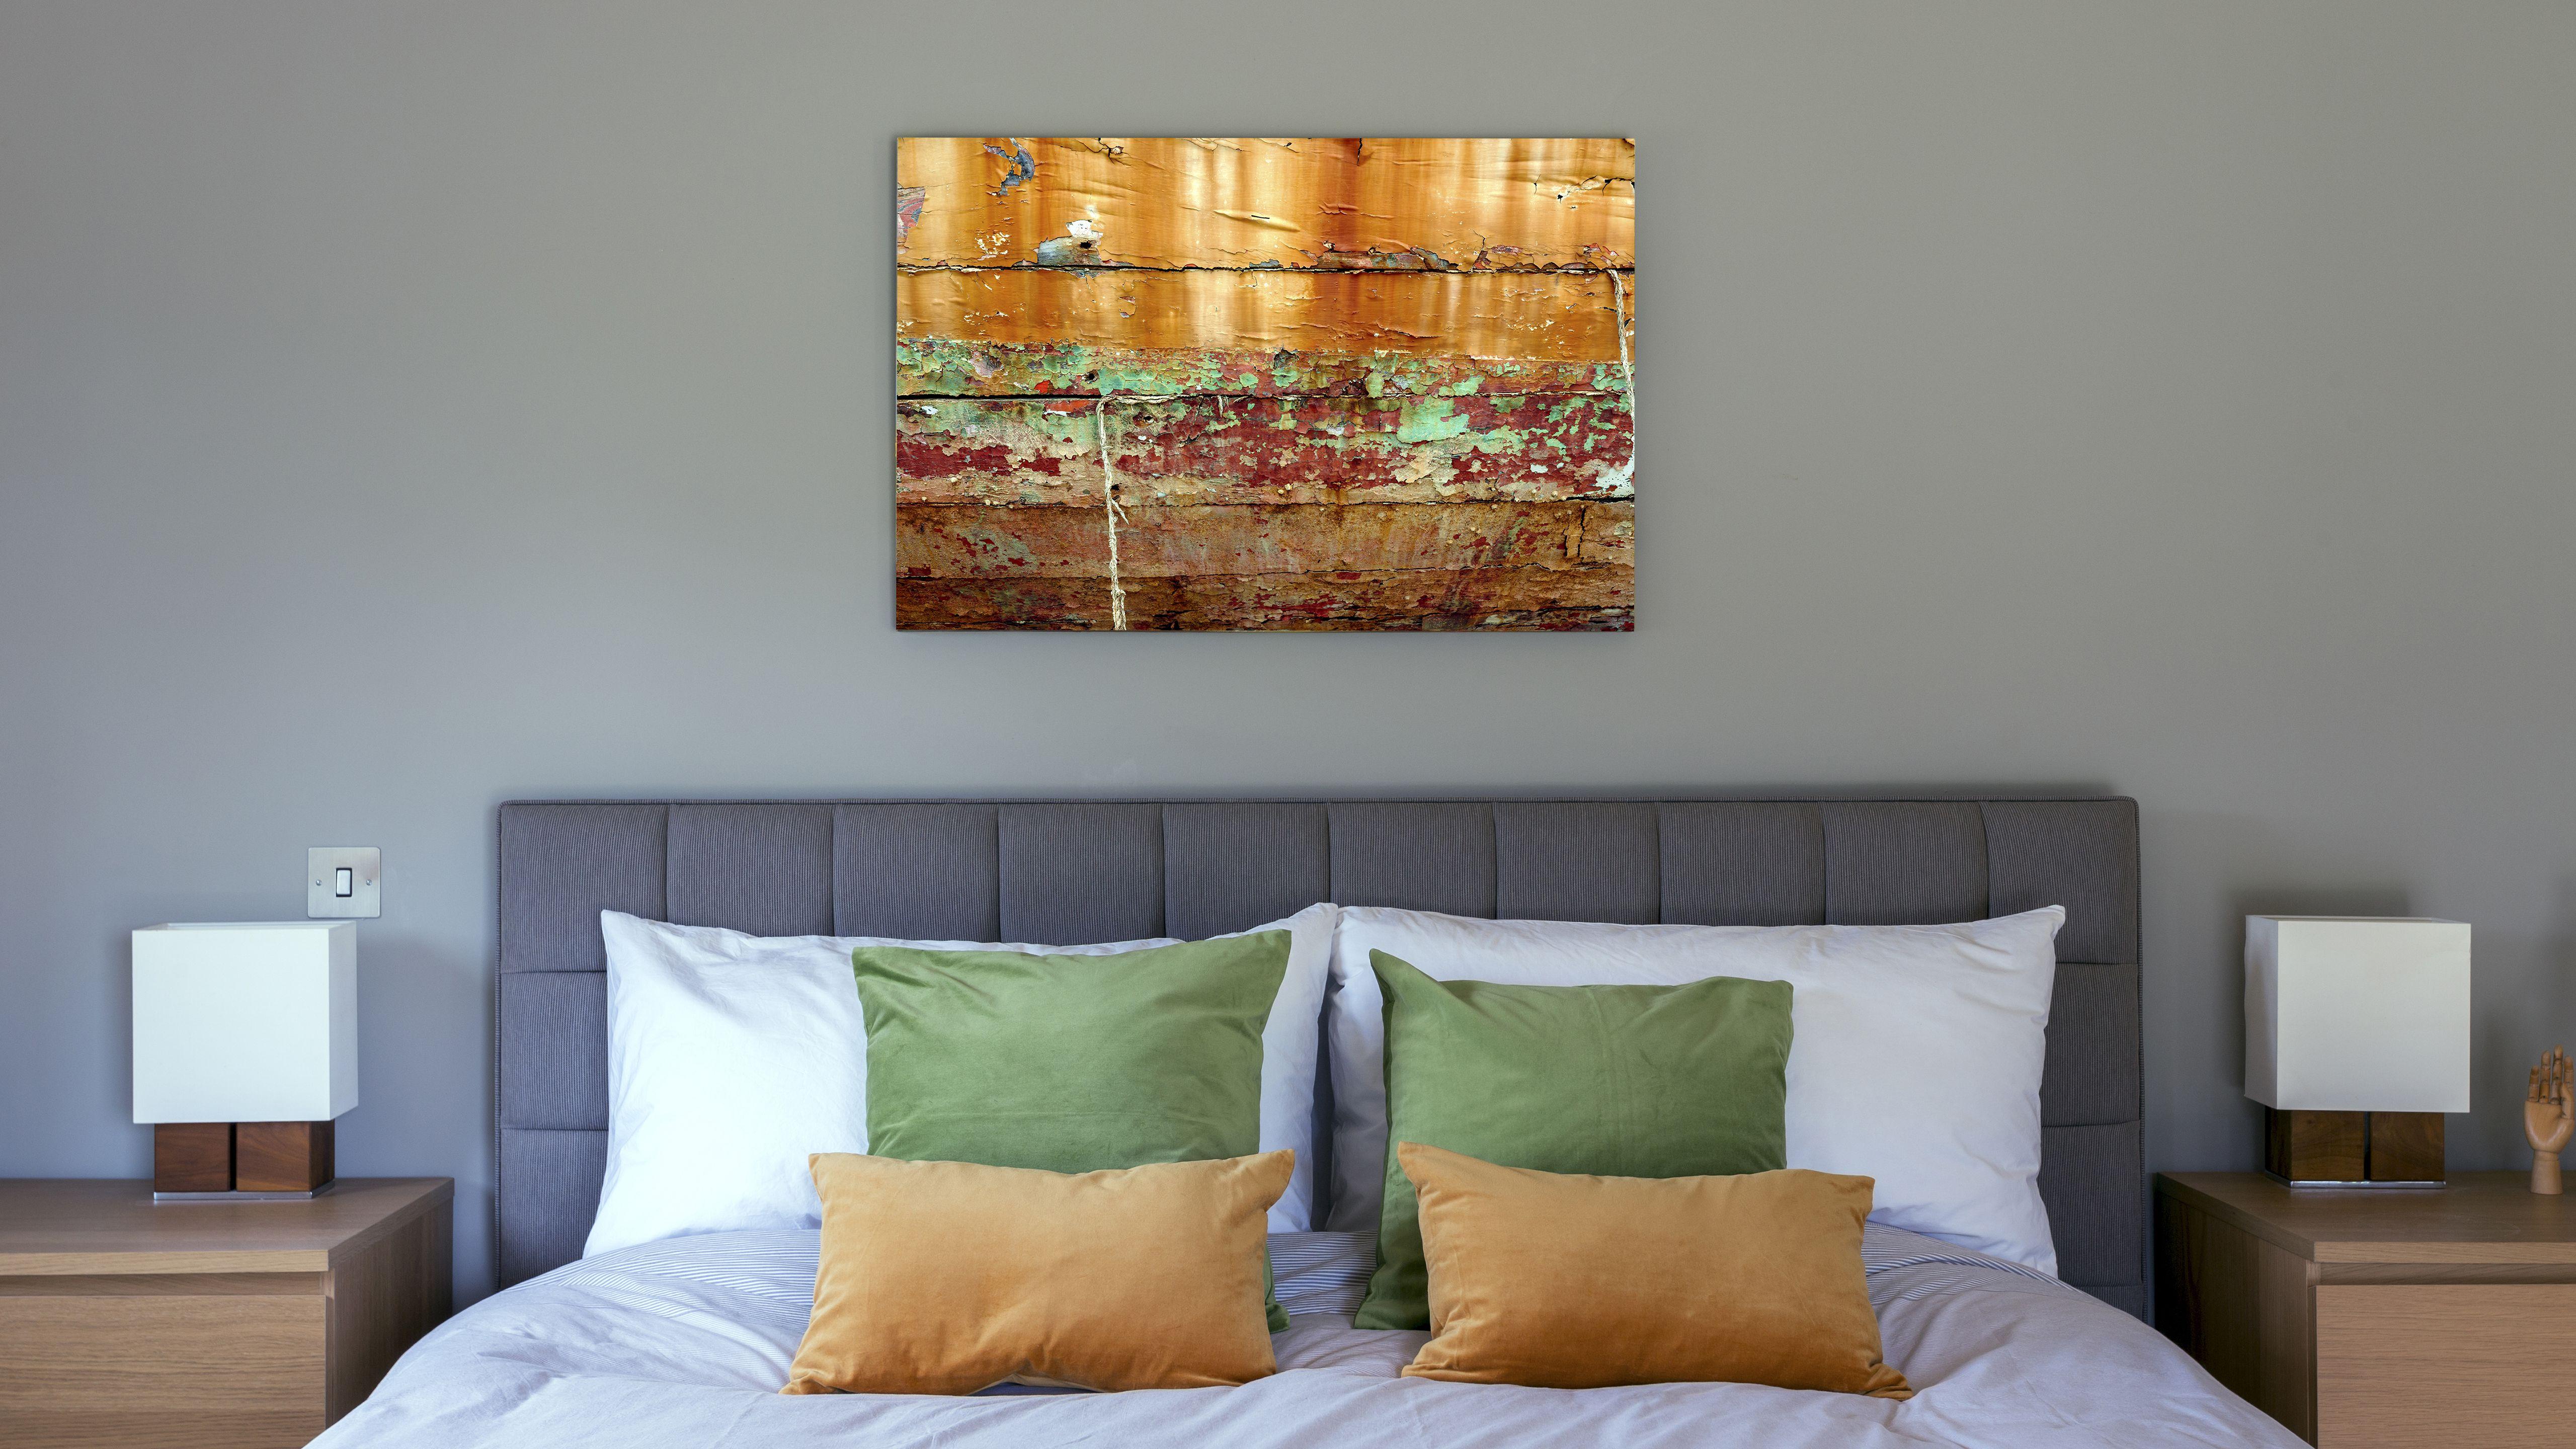 wall art in bedroom